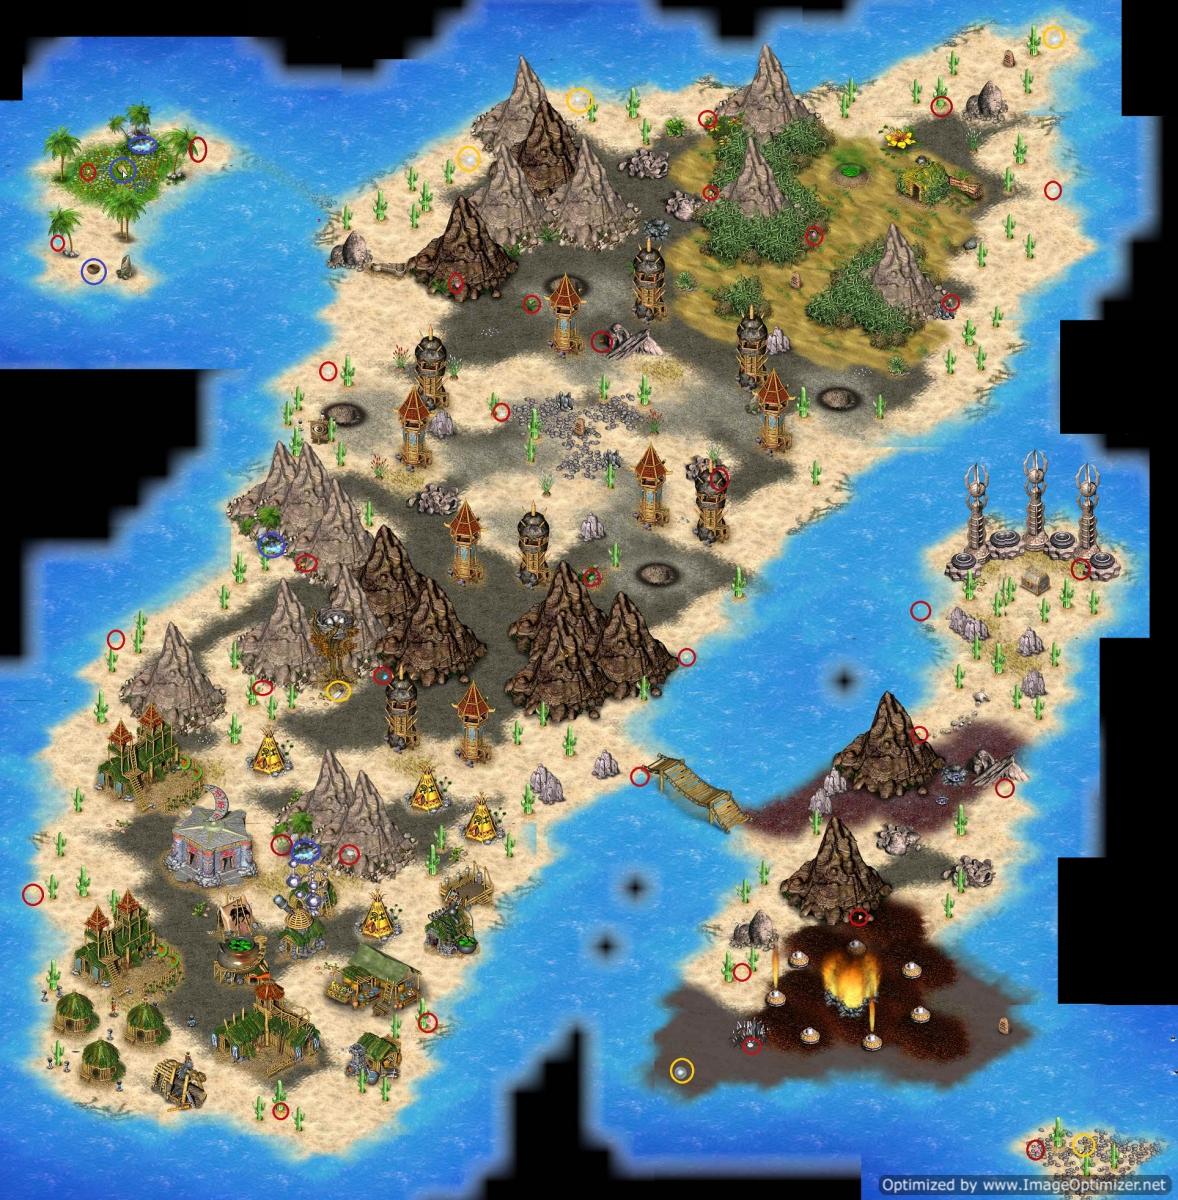 totem-tribe-gold:beetle-island.jpg